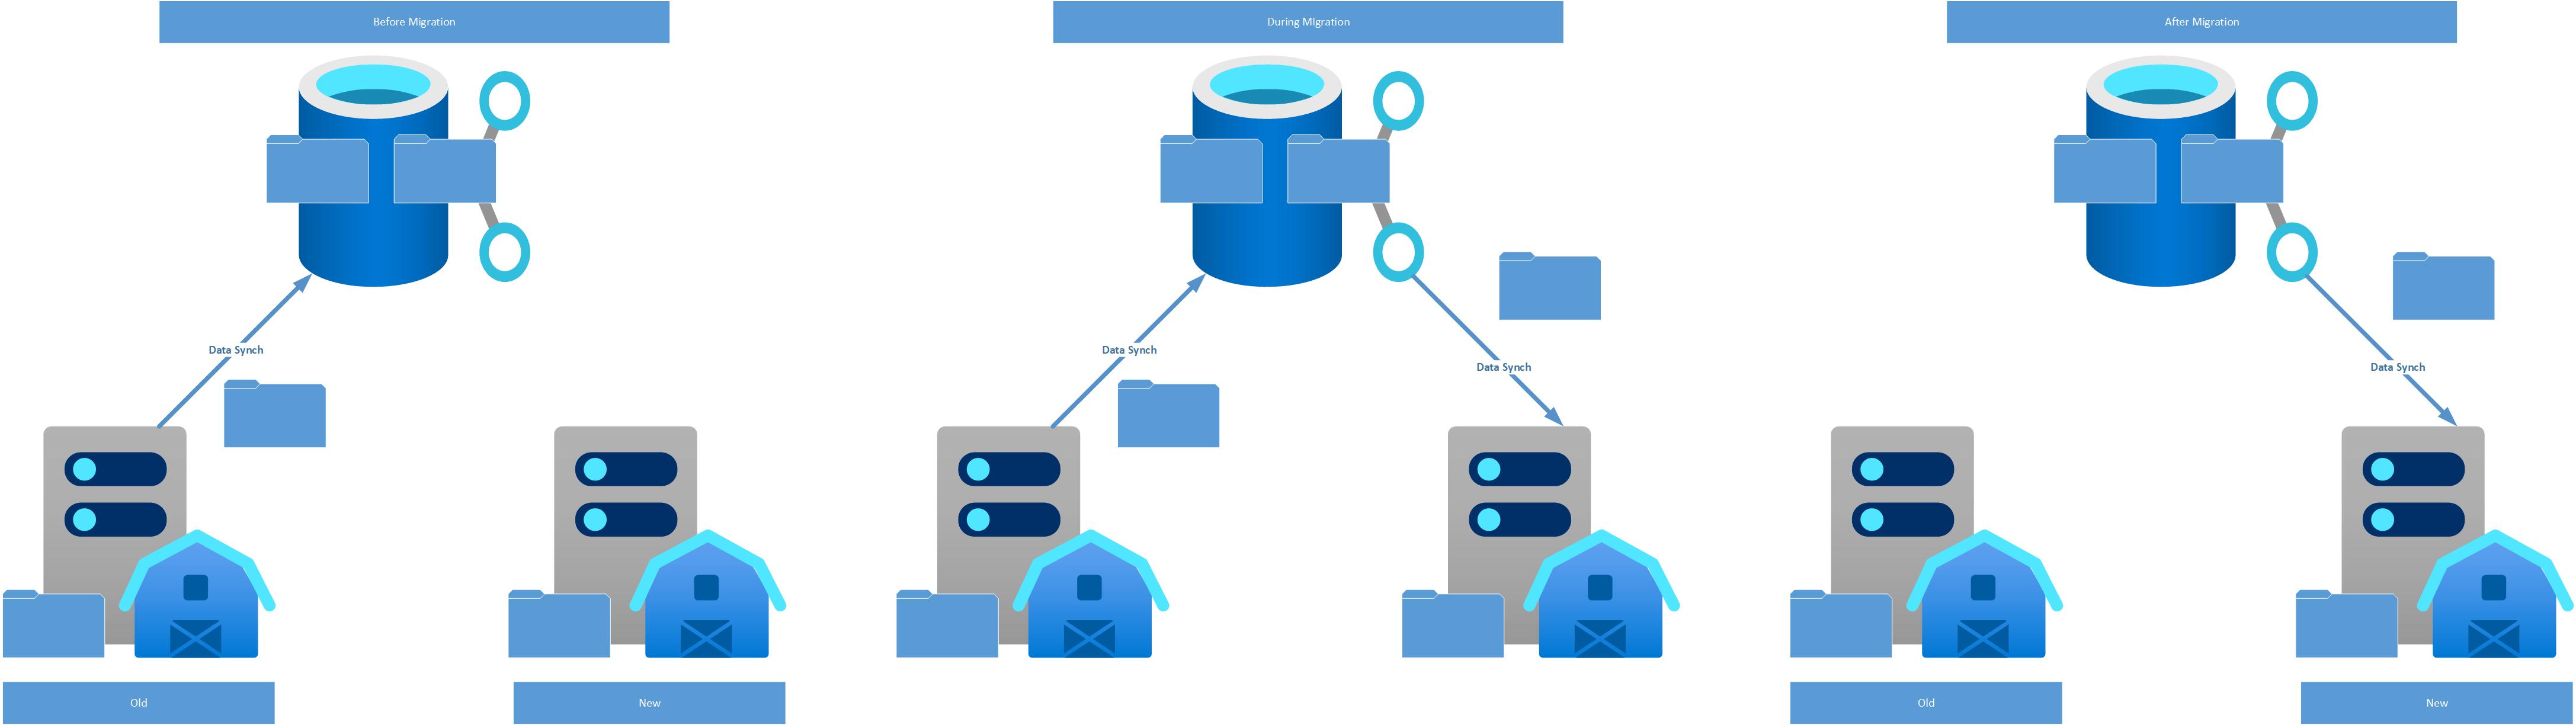 Fileserver Migration